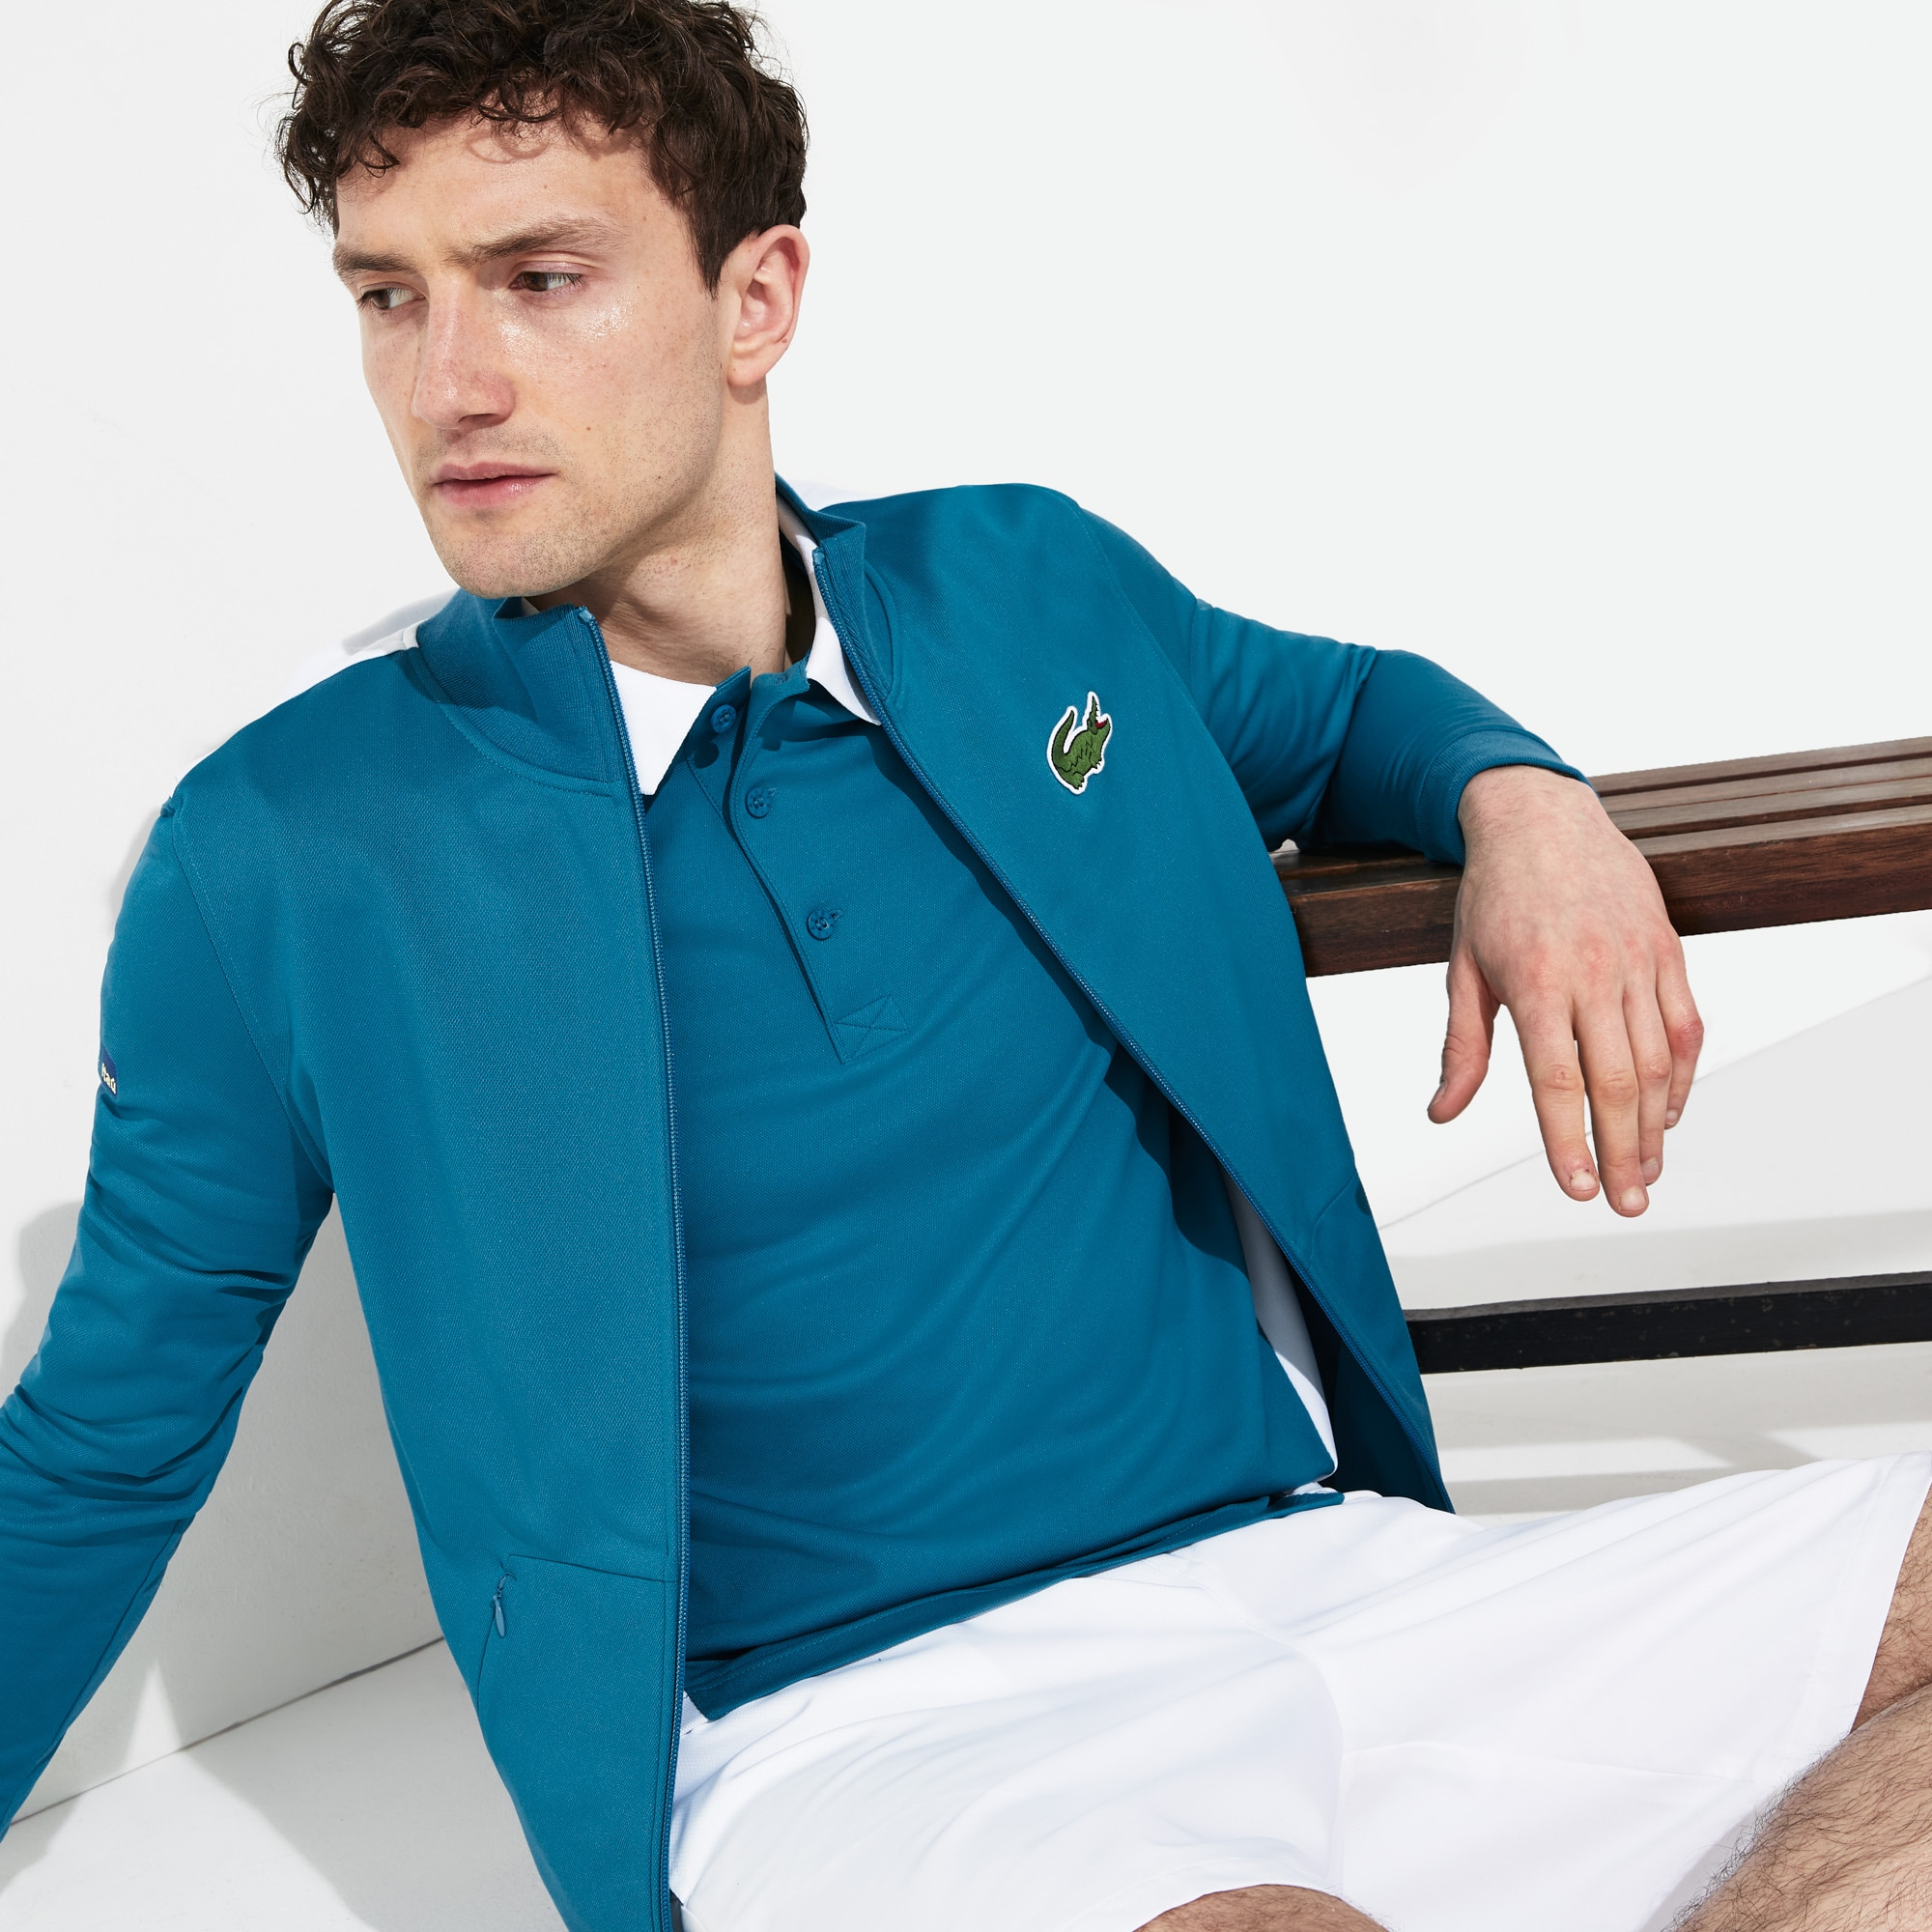 cb9805d8 Men's Jackets and Coats | Lacoste Outerwear | LACOSTE